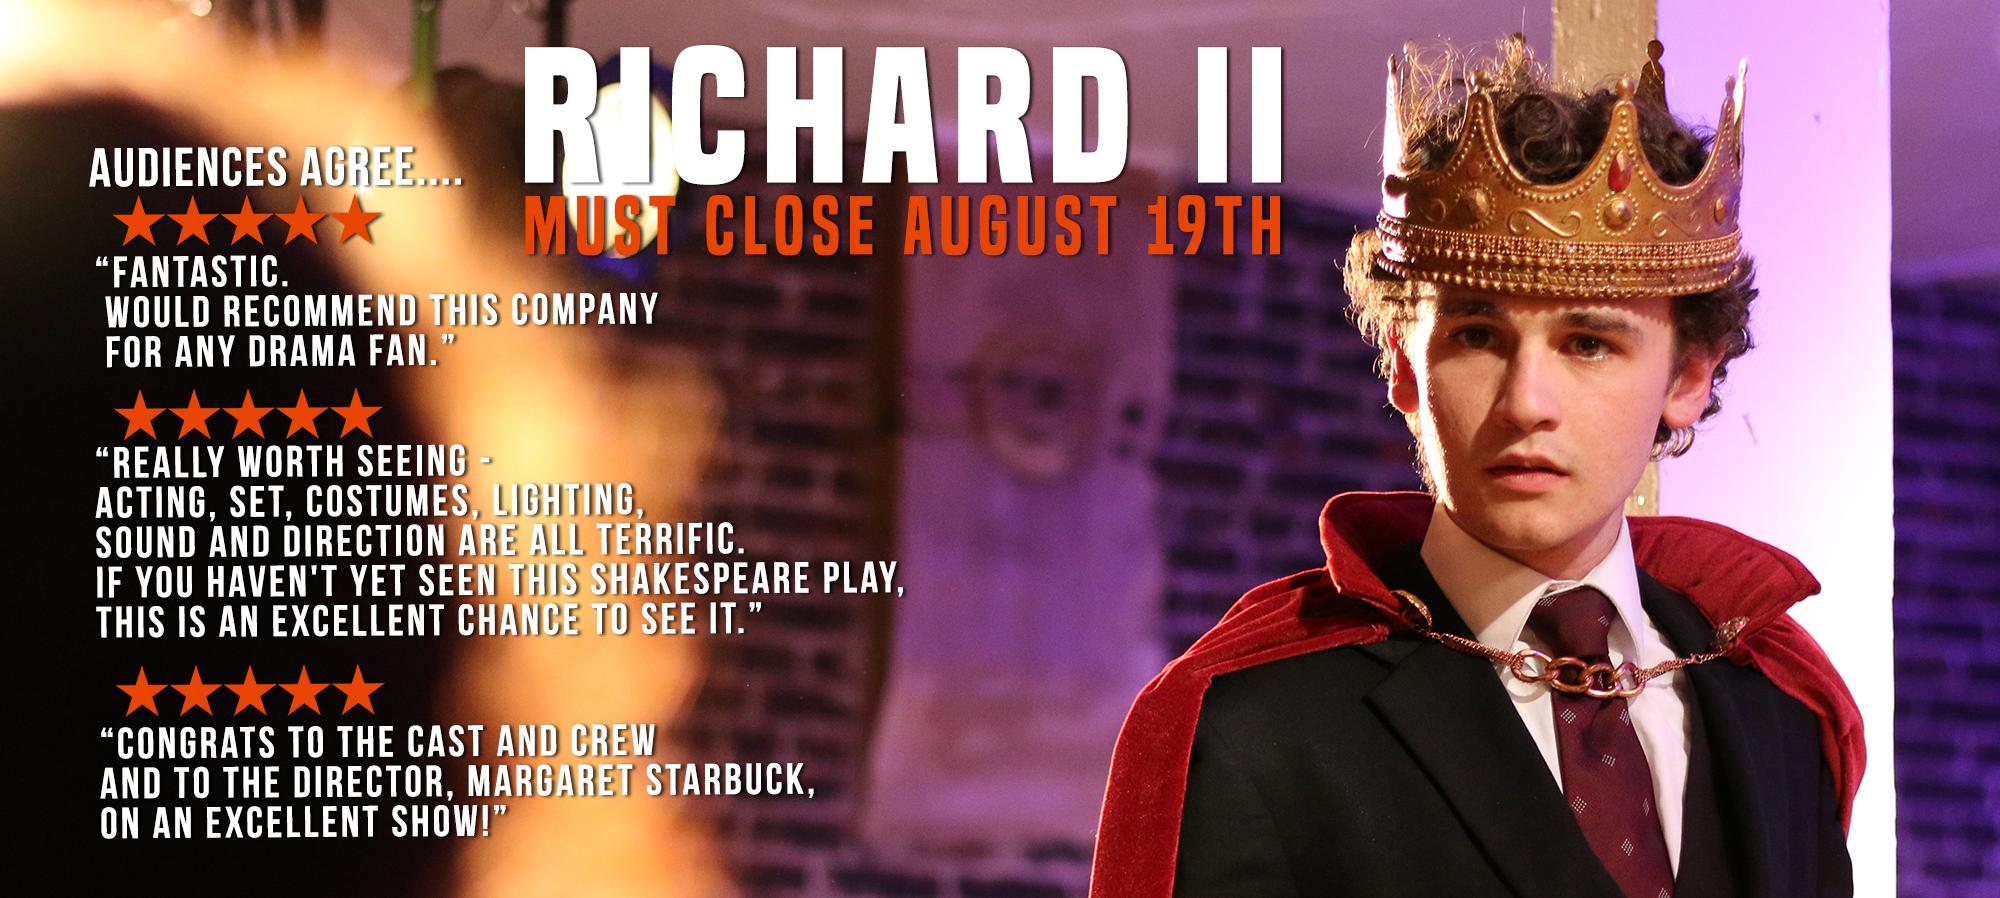 richard ii opening reviews for website banner